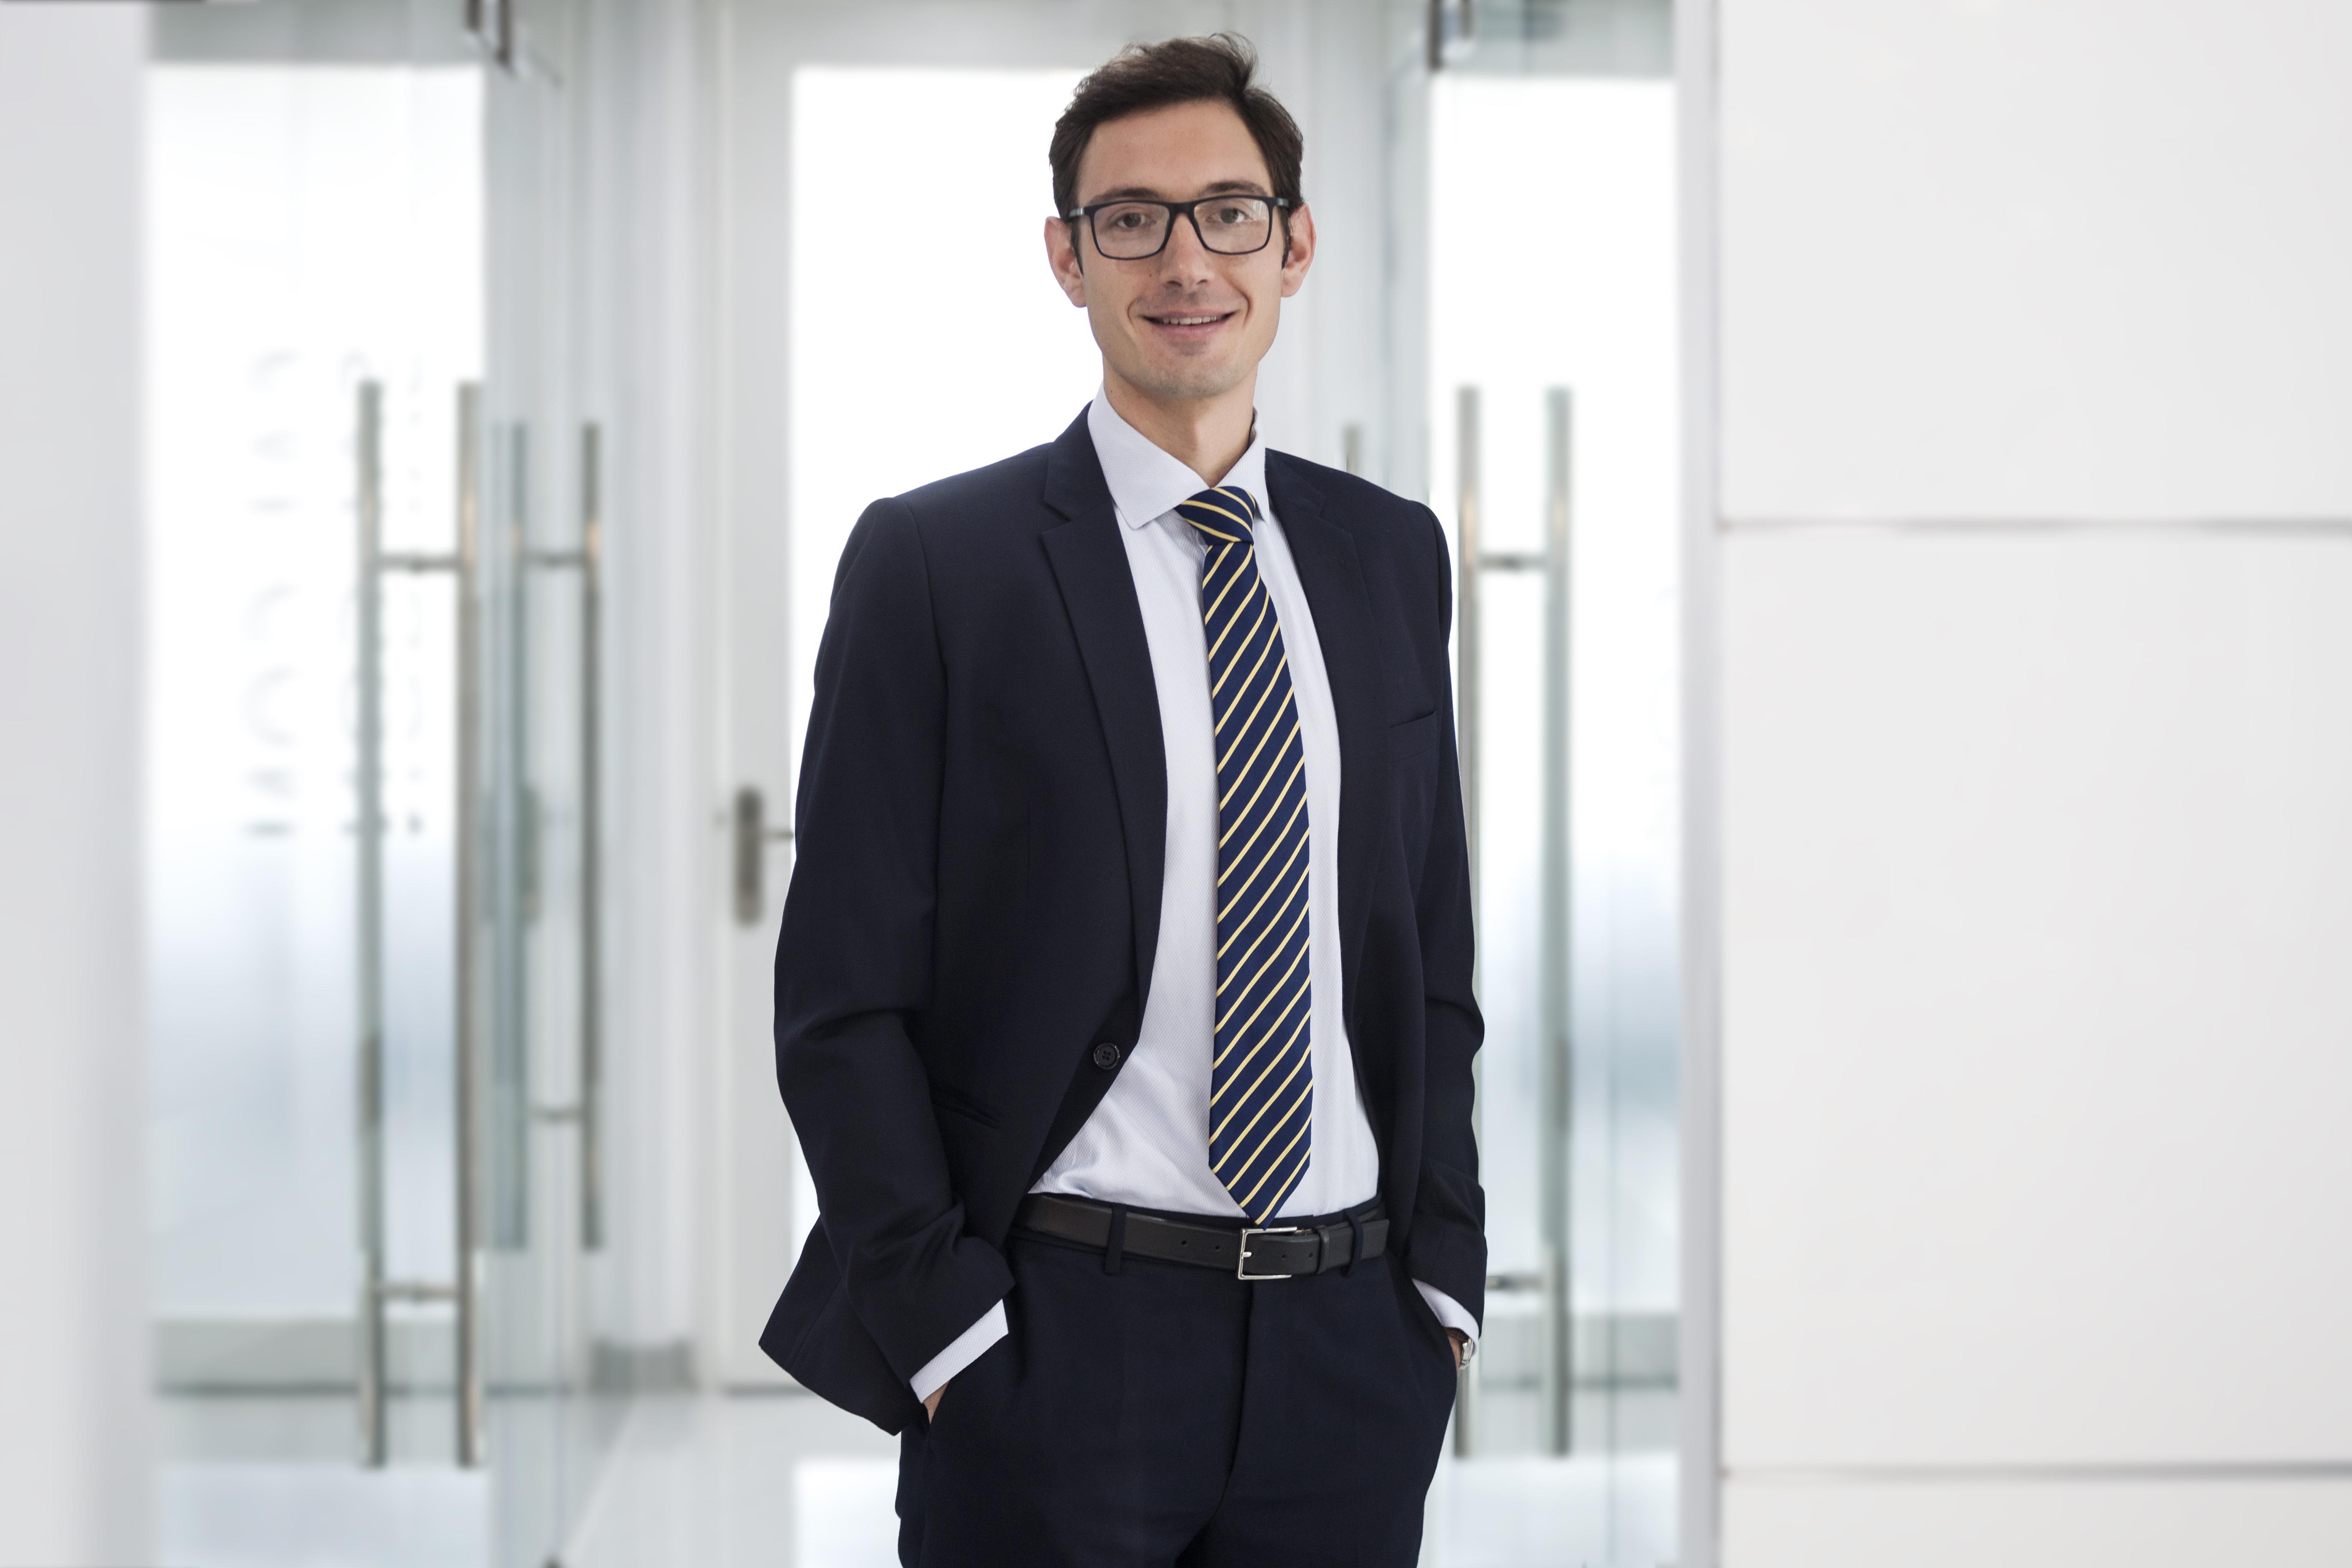 Adrien Bizouard, Country Manager of Robert Walters Vietnam